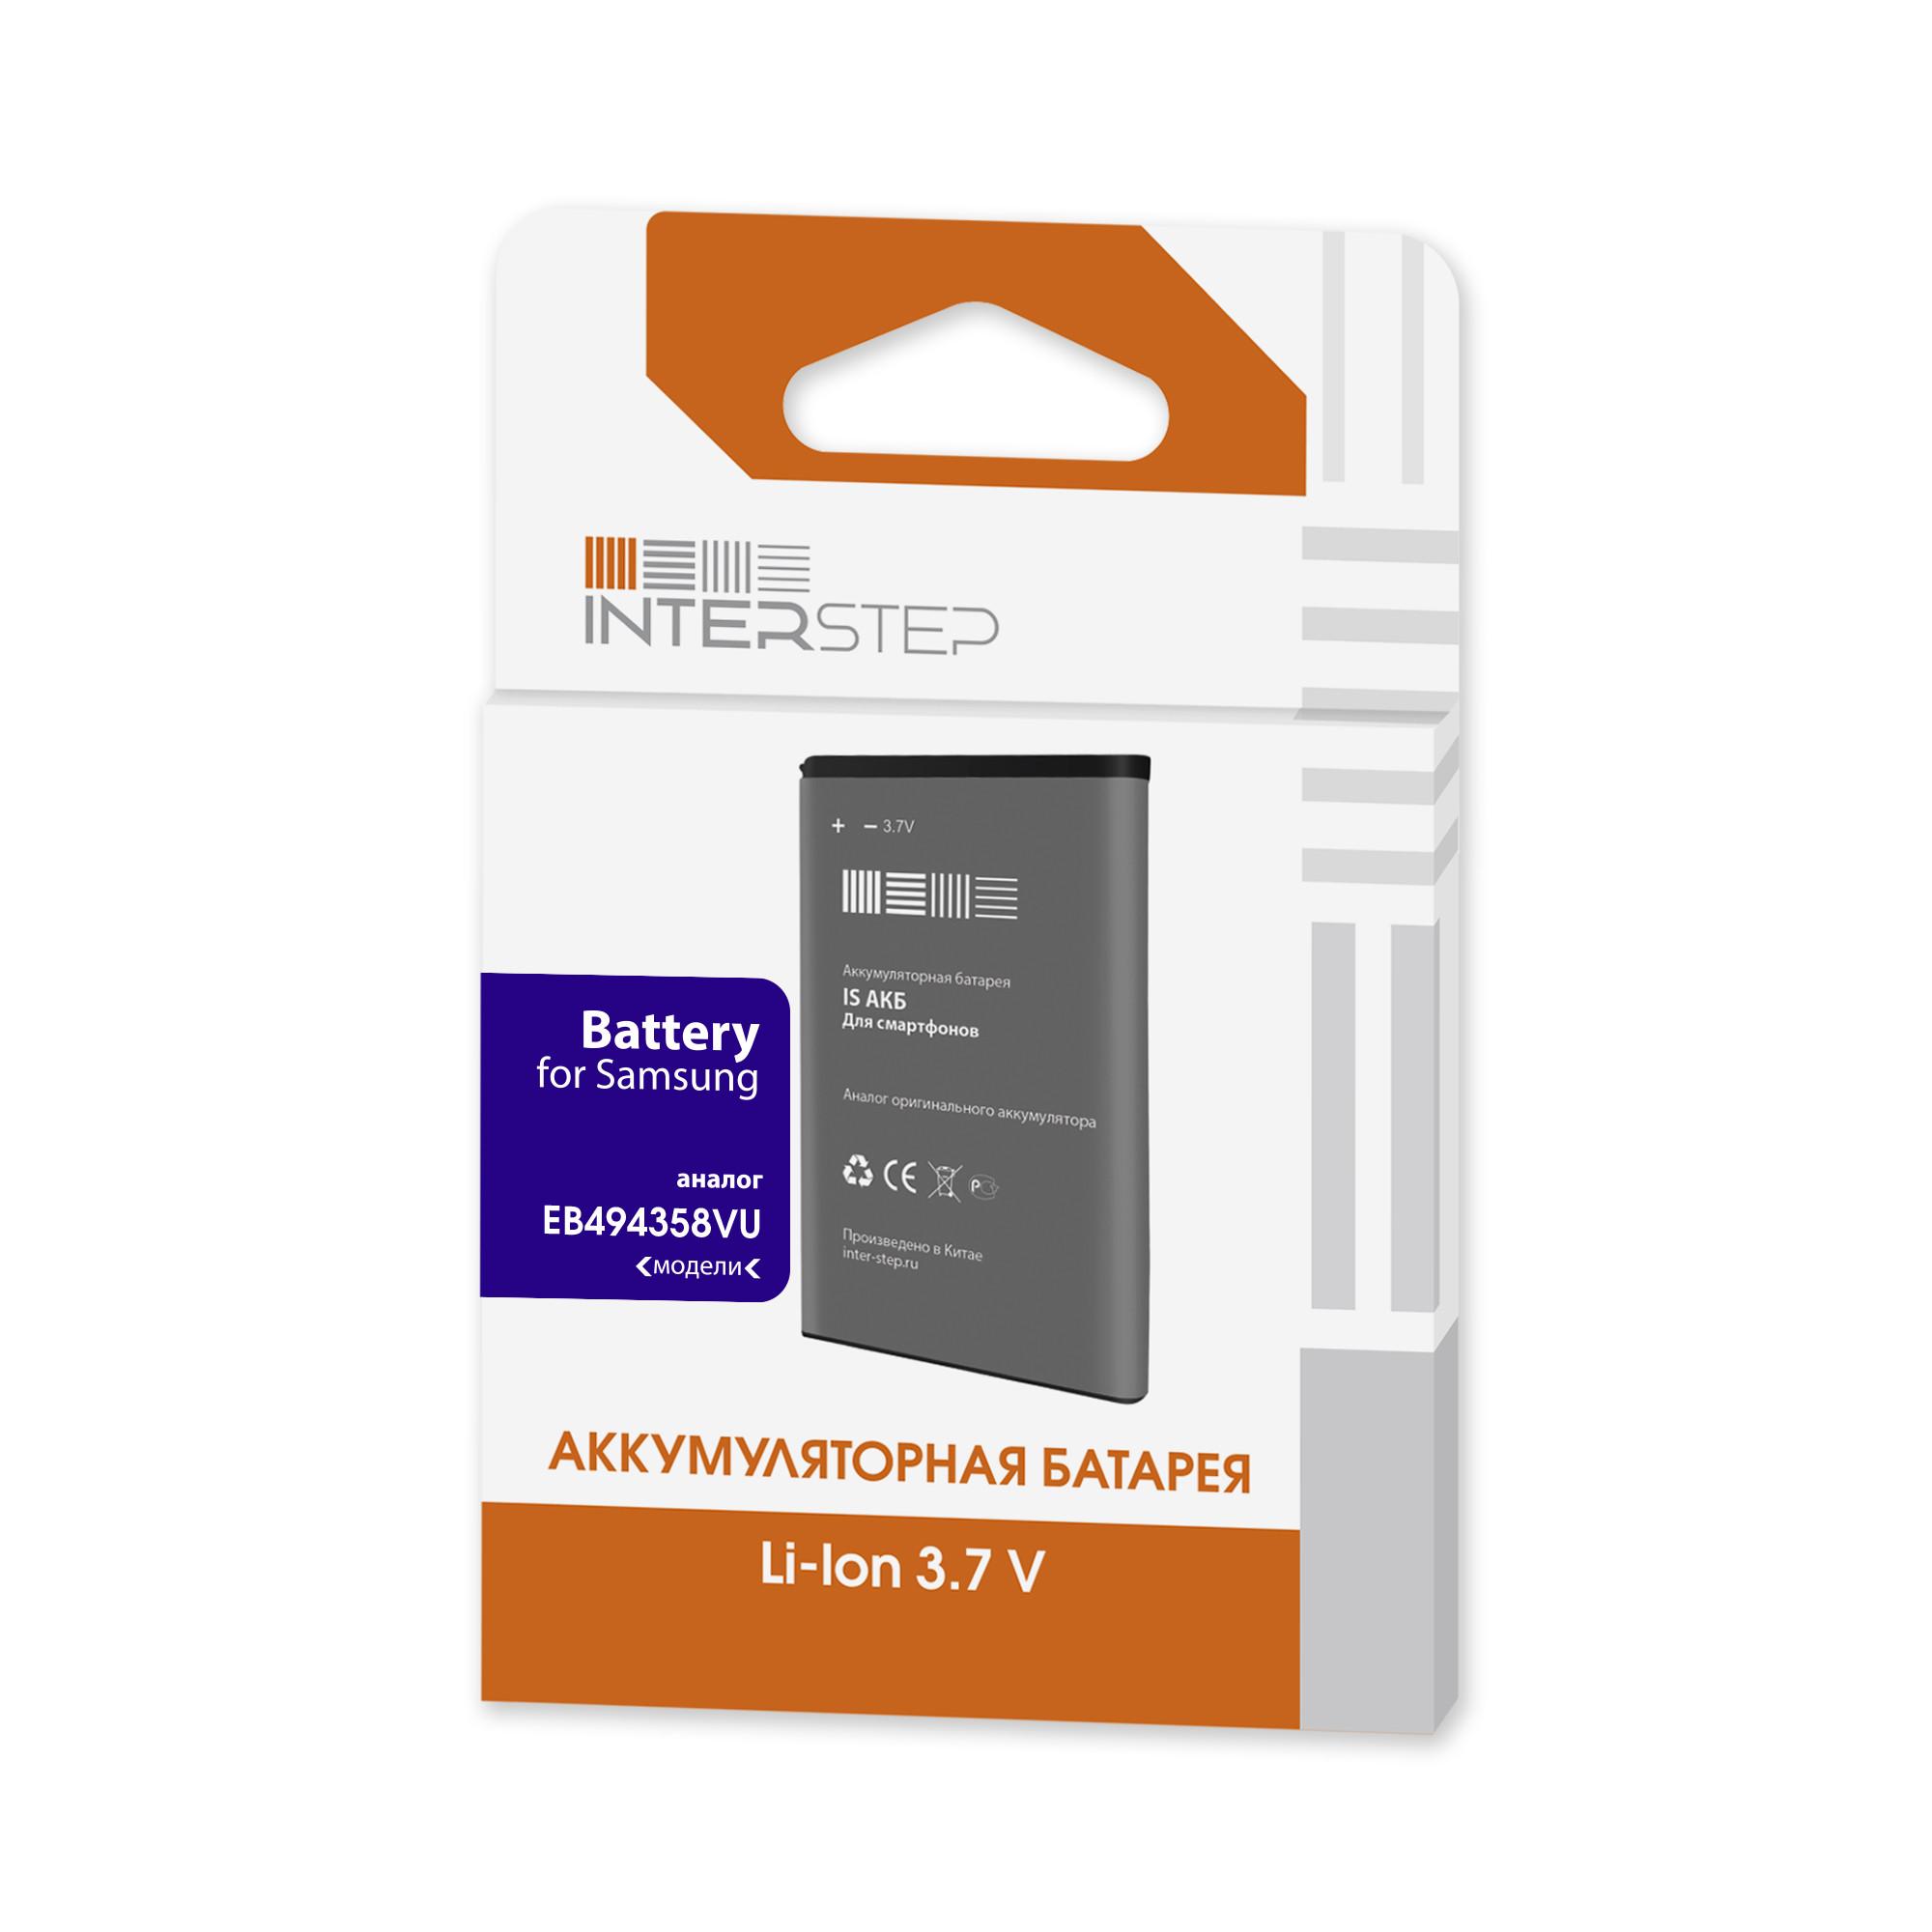 Interstep Аккумулятор Для Телефона Samsung Gt-S5830 / S5660 1350 Мач InterStep